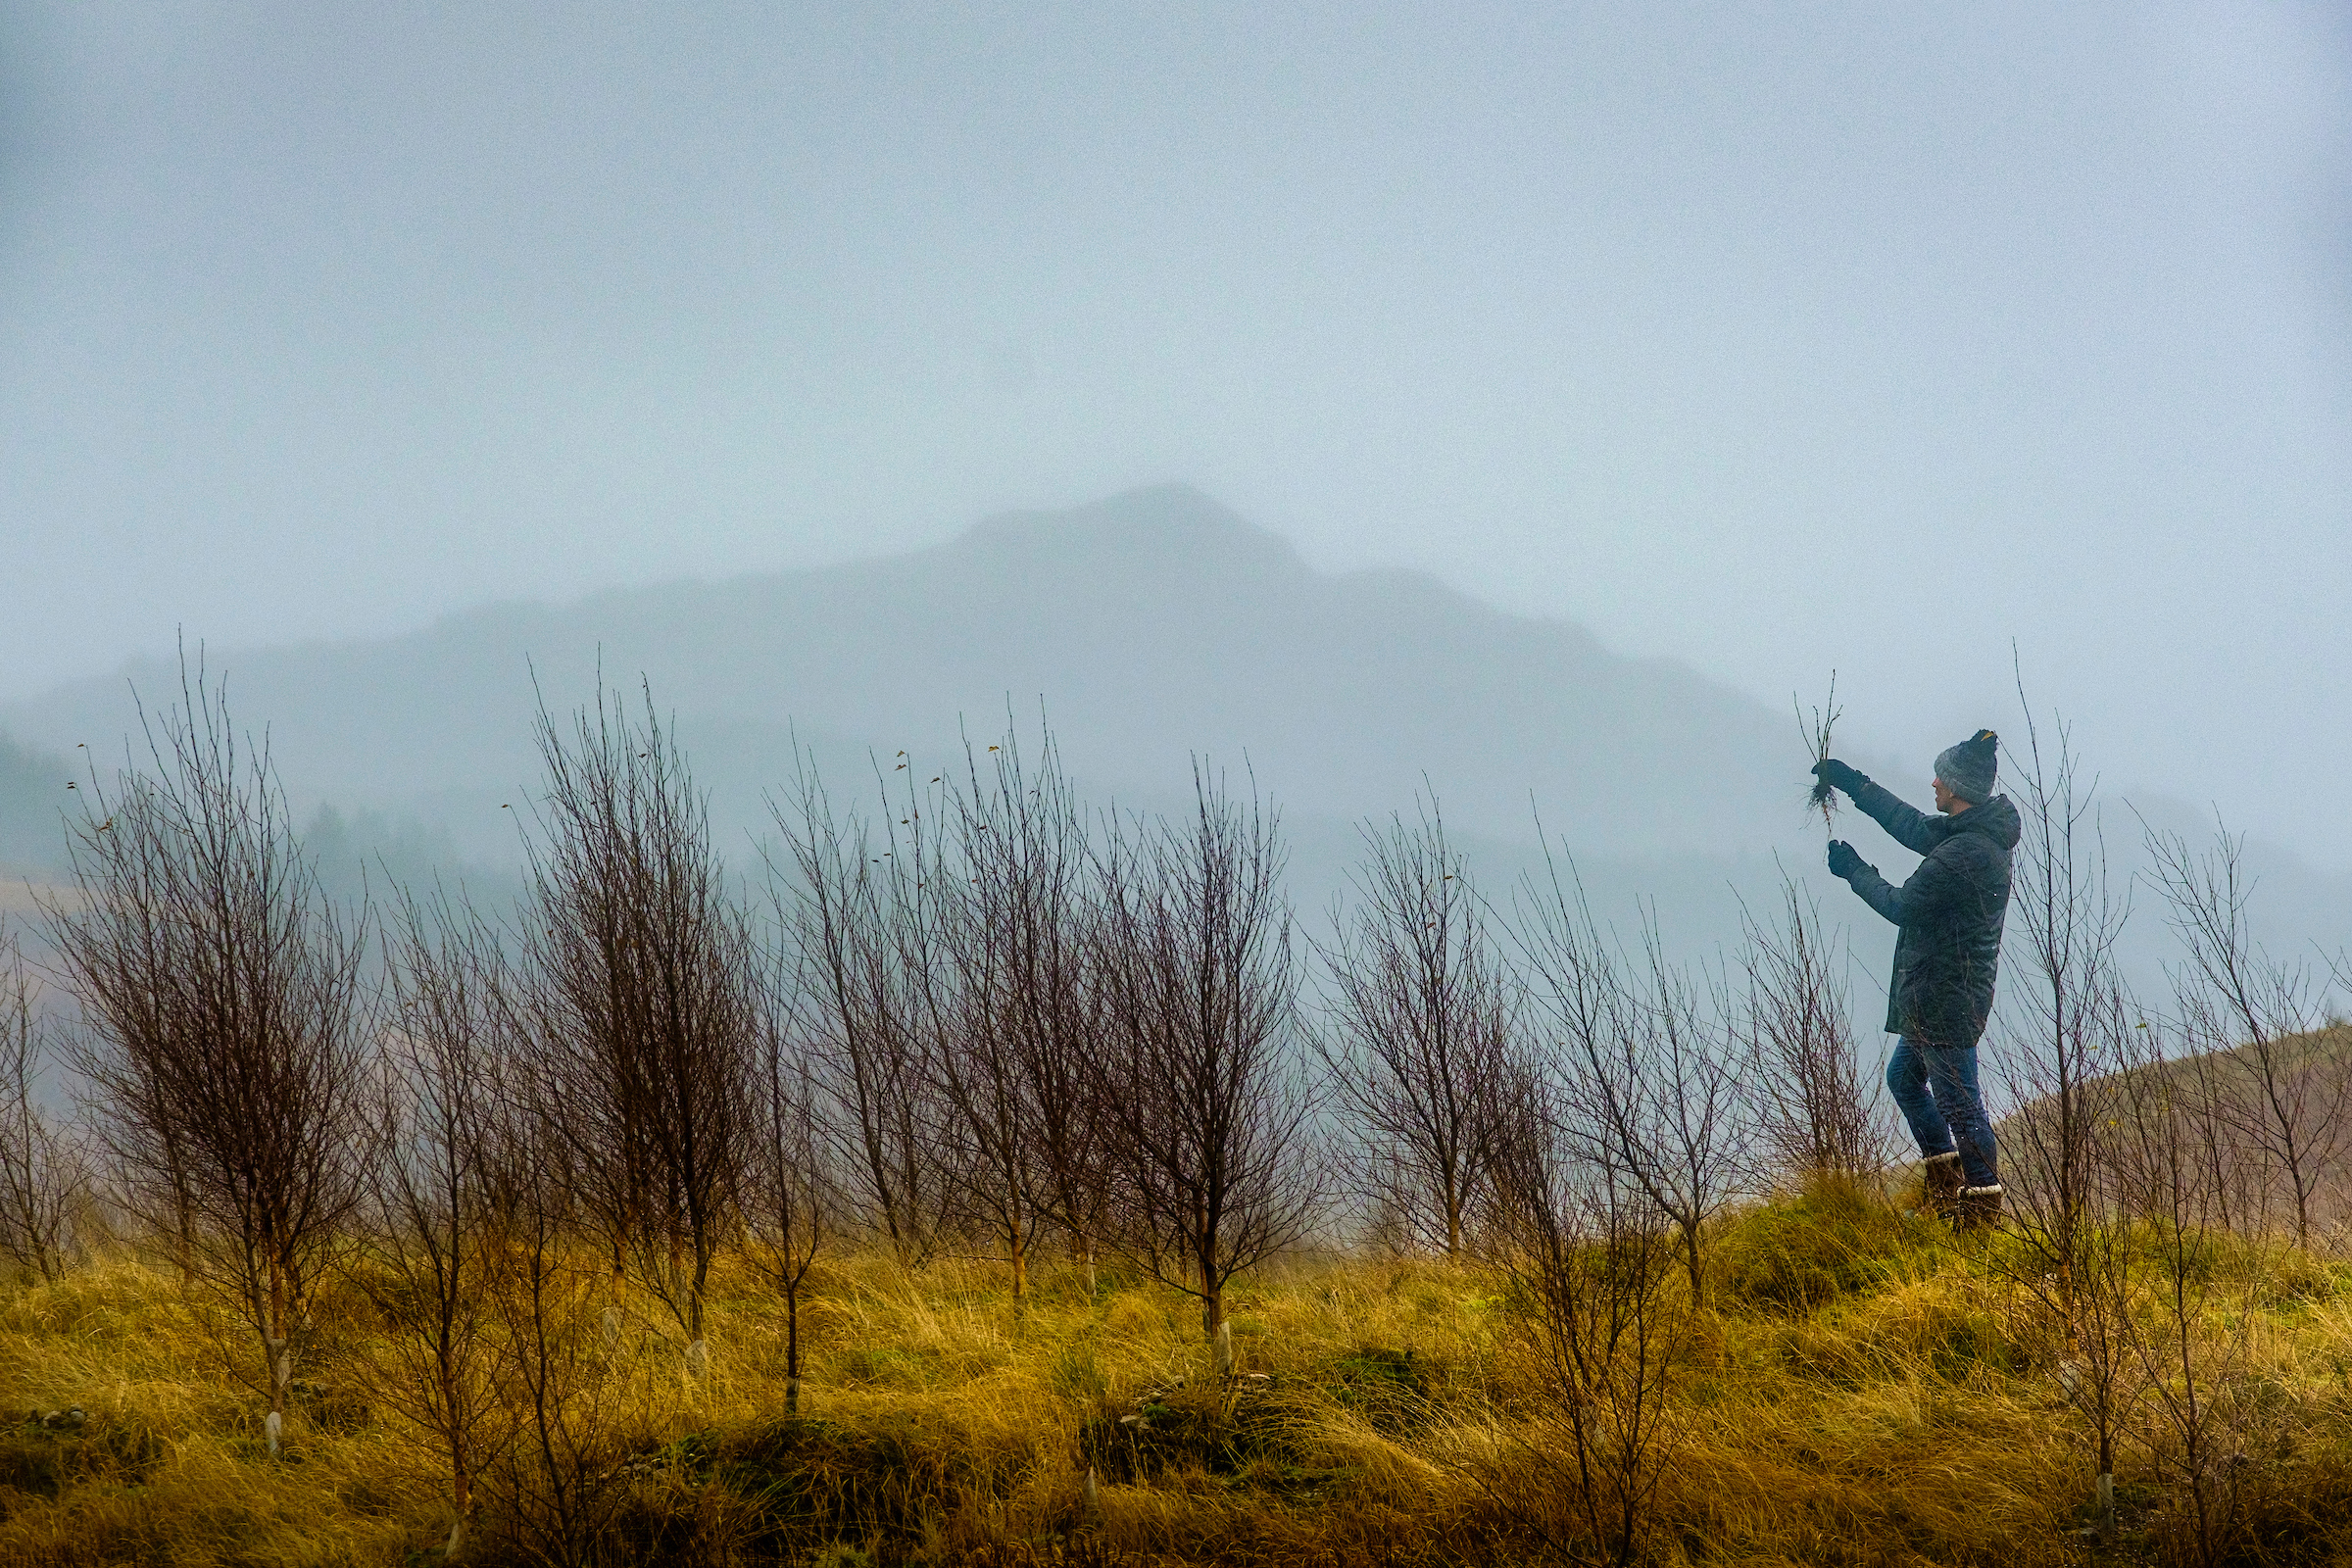 Johnnie Walker tree planting - Business News Scotland